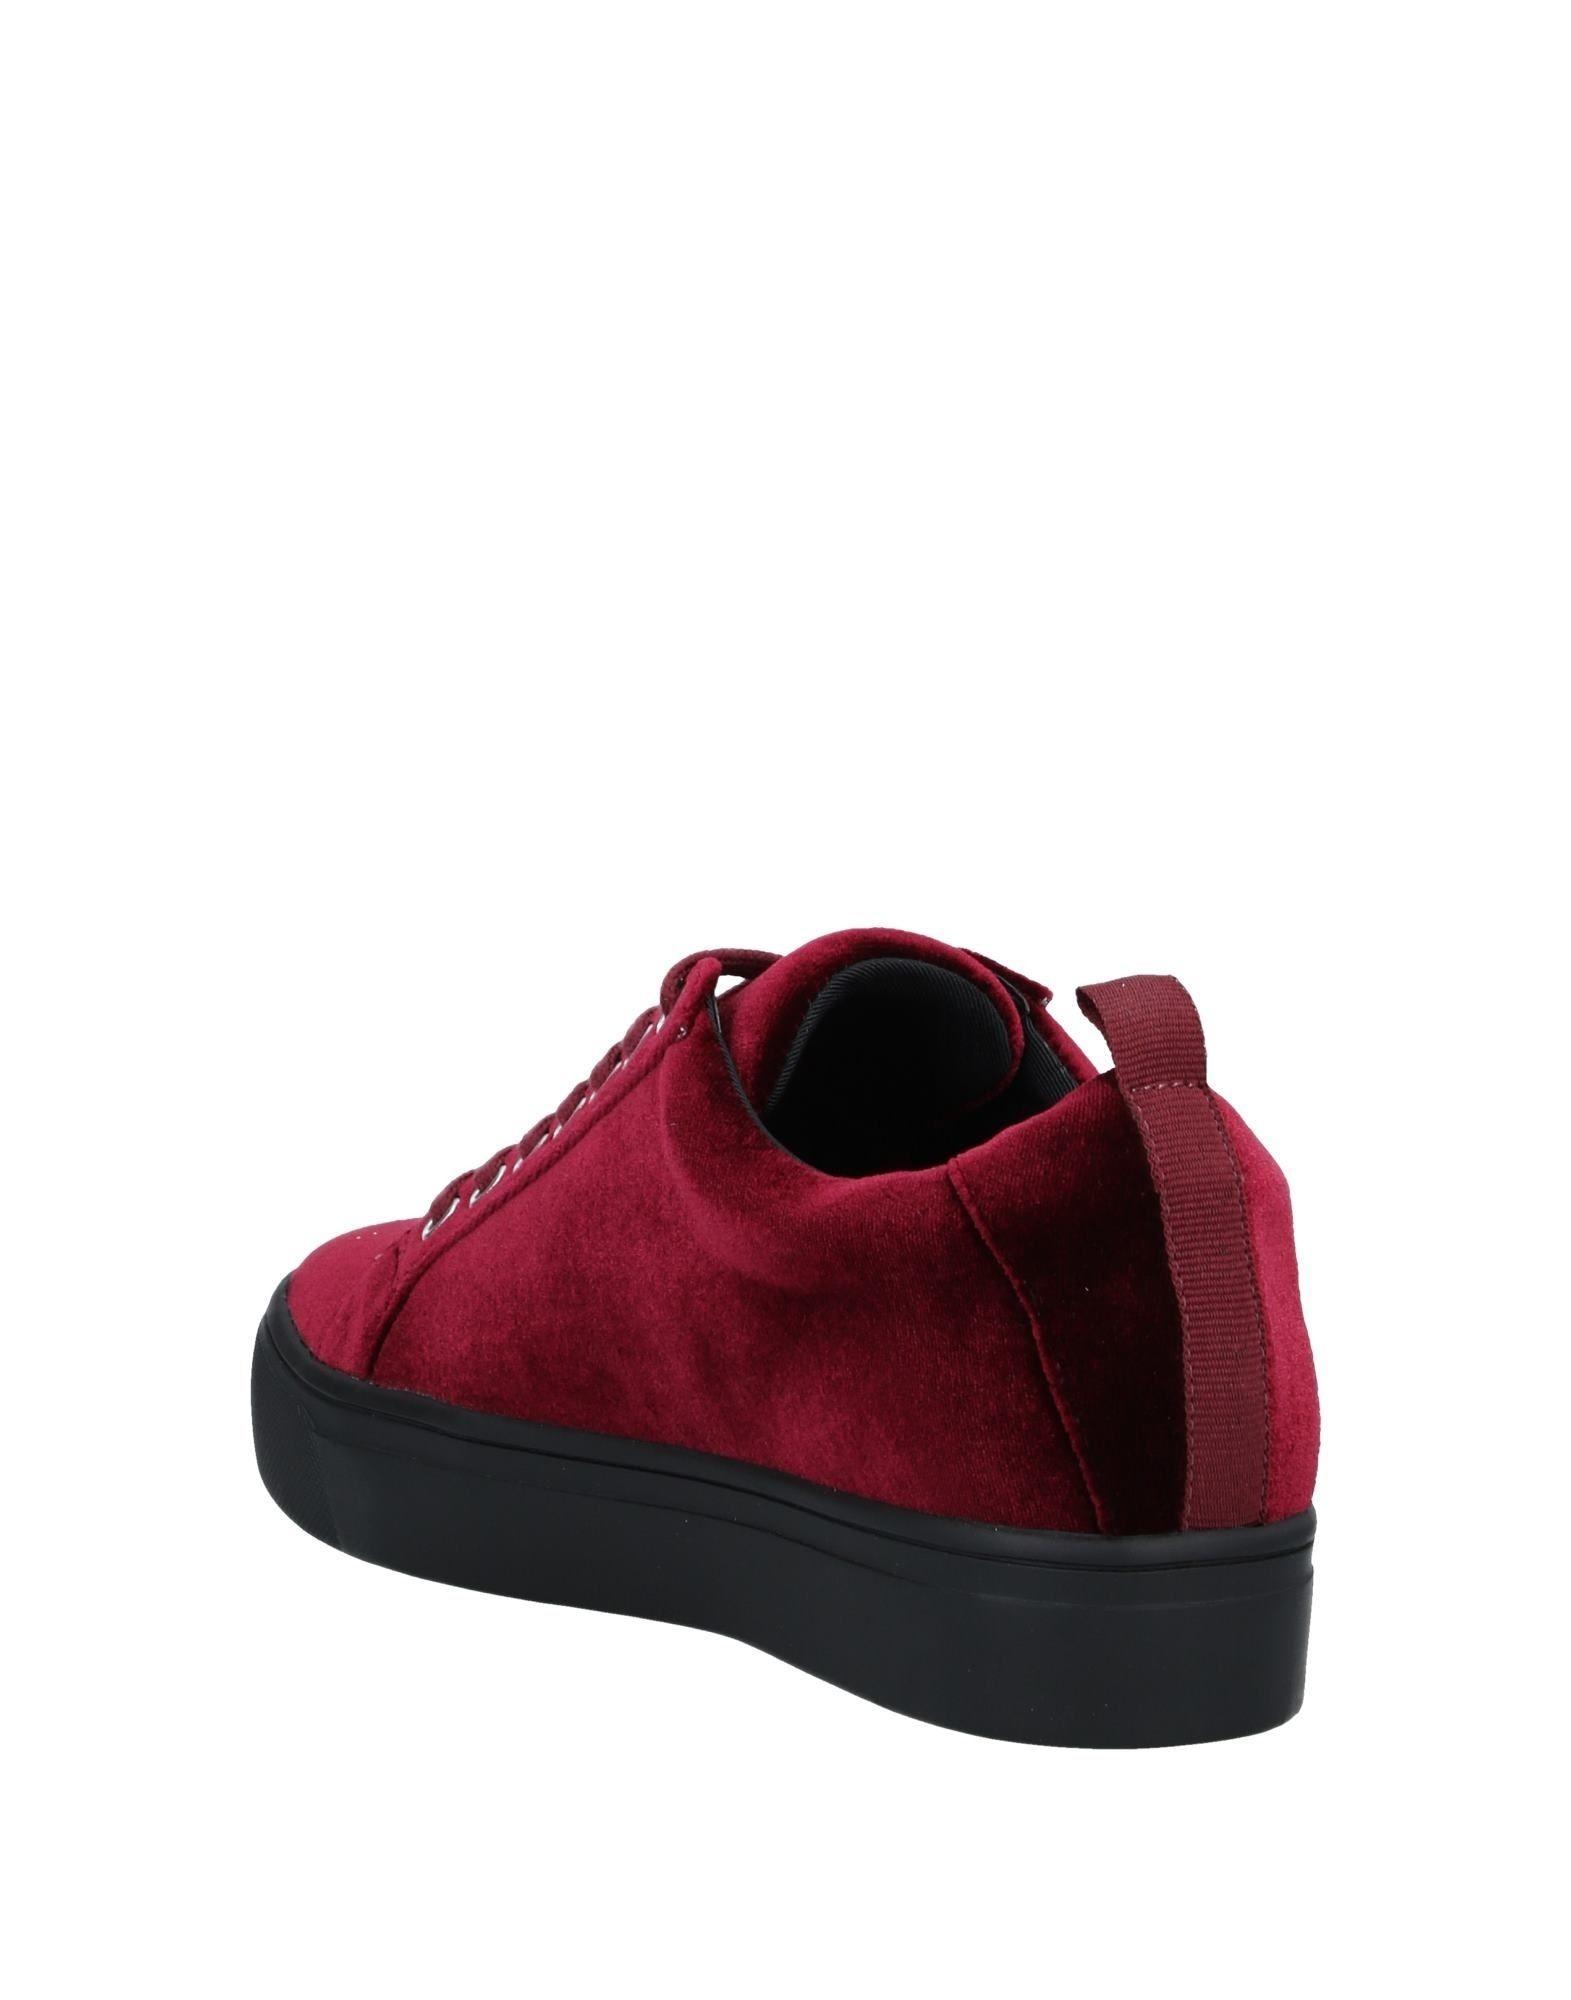 Sneakers & Deportivas Gattinoni de color Rojo